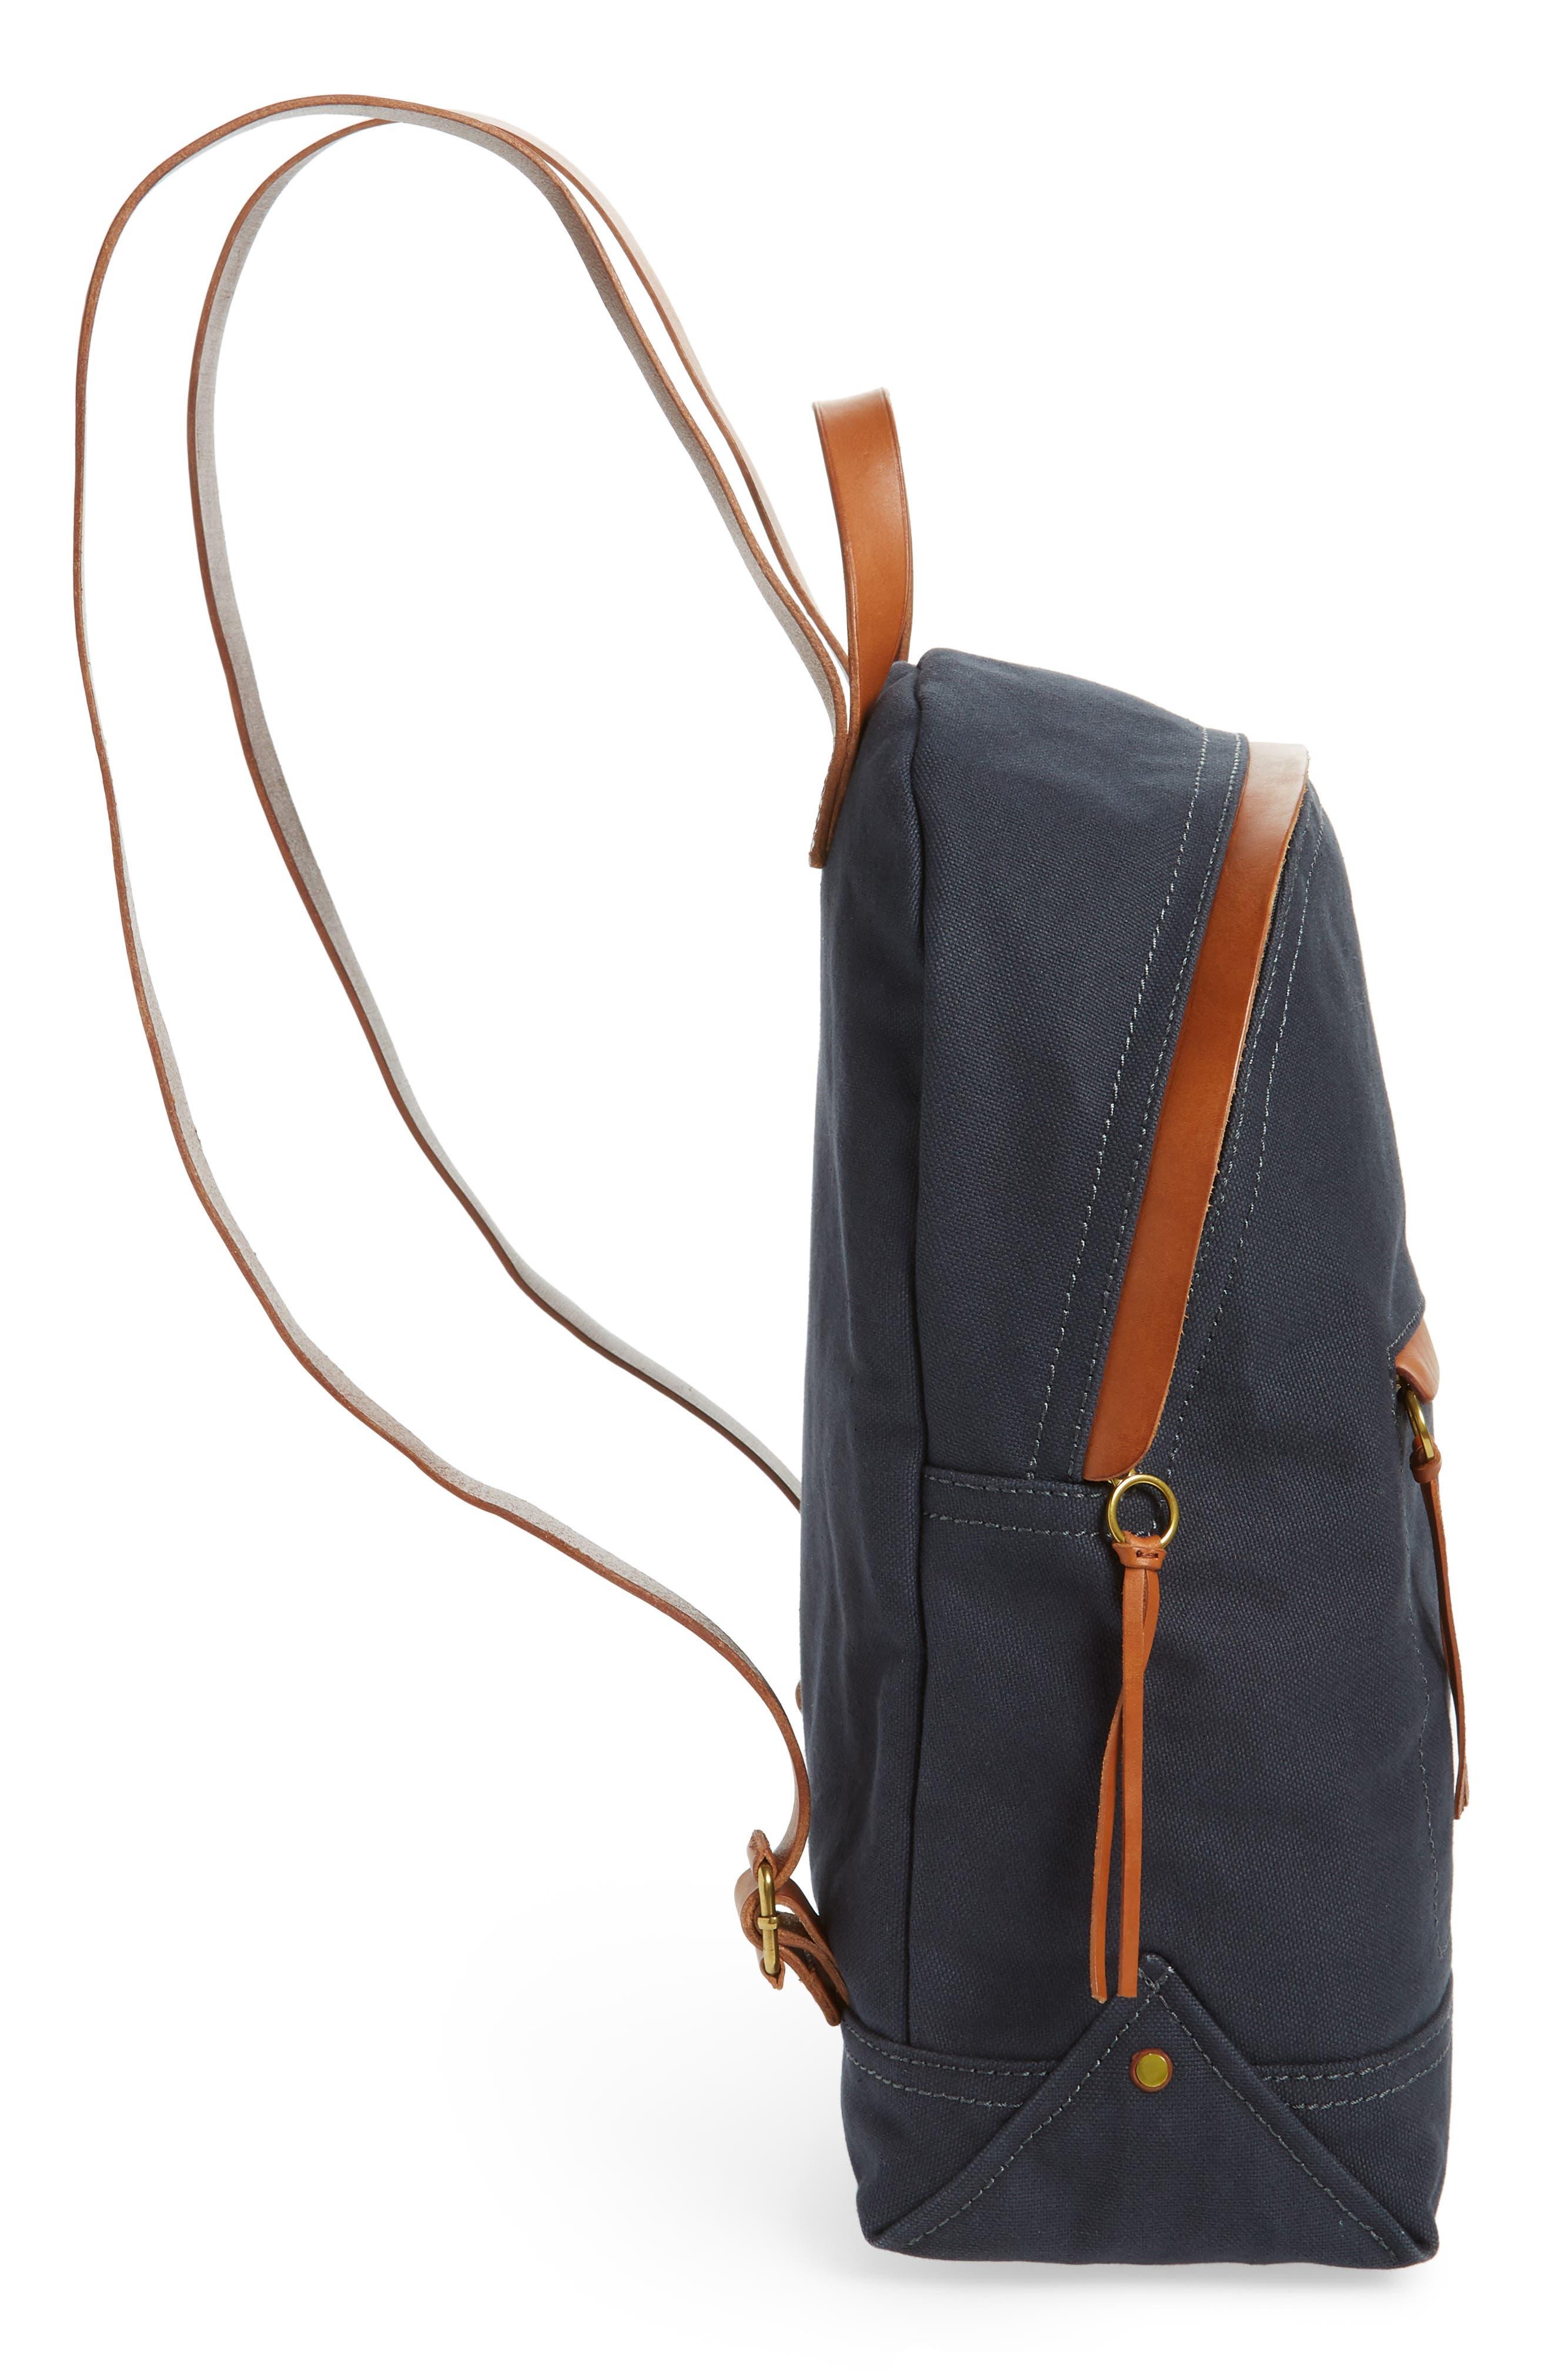 MADEWELL, The Charleston Backpack, Alternate thumbnail 6, color, BLACK SEA